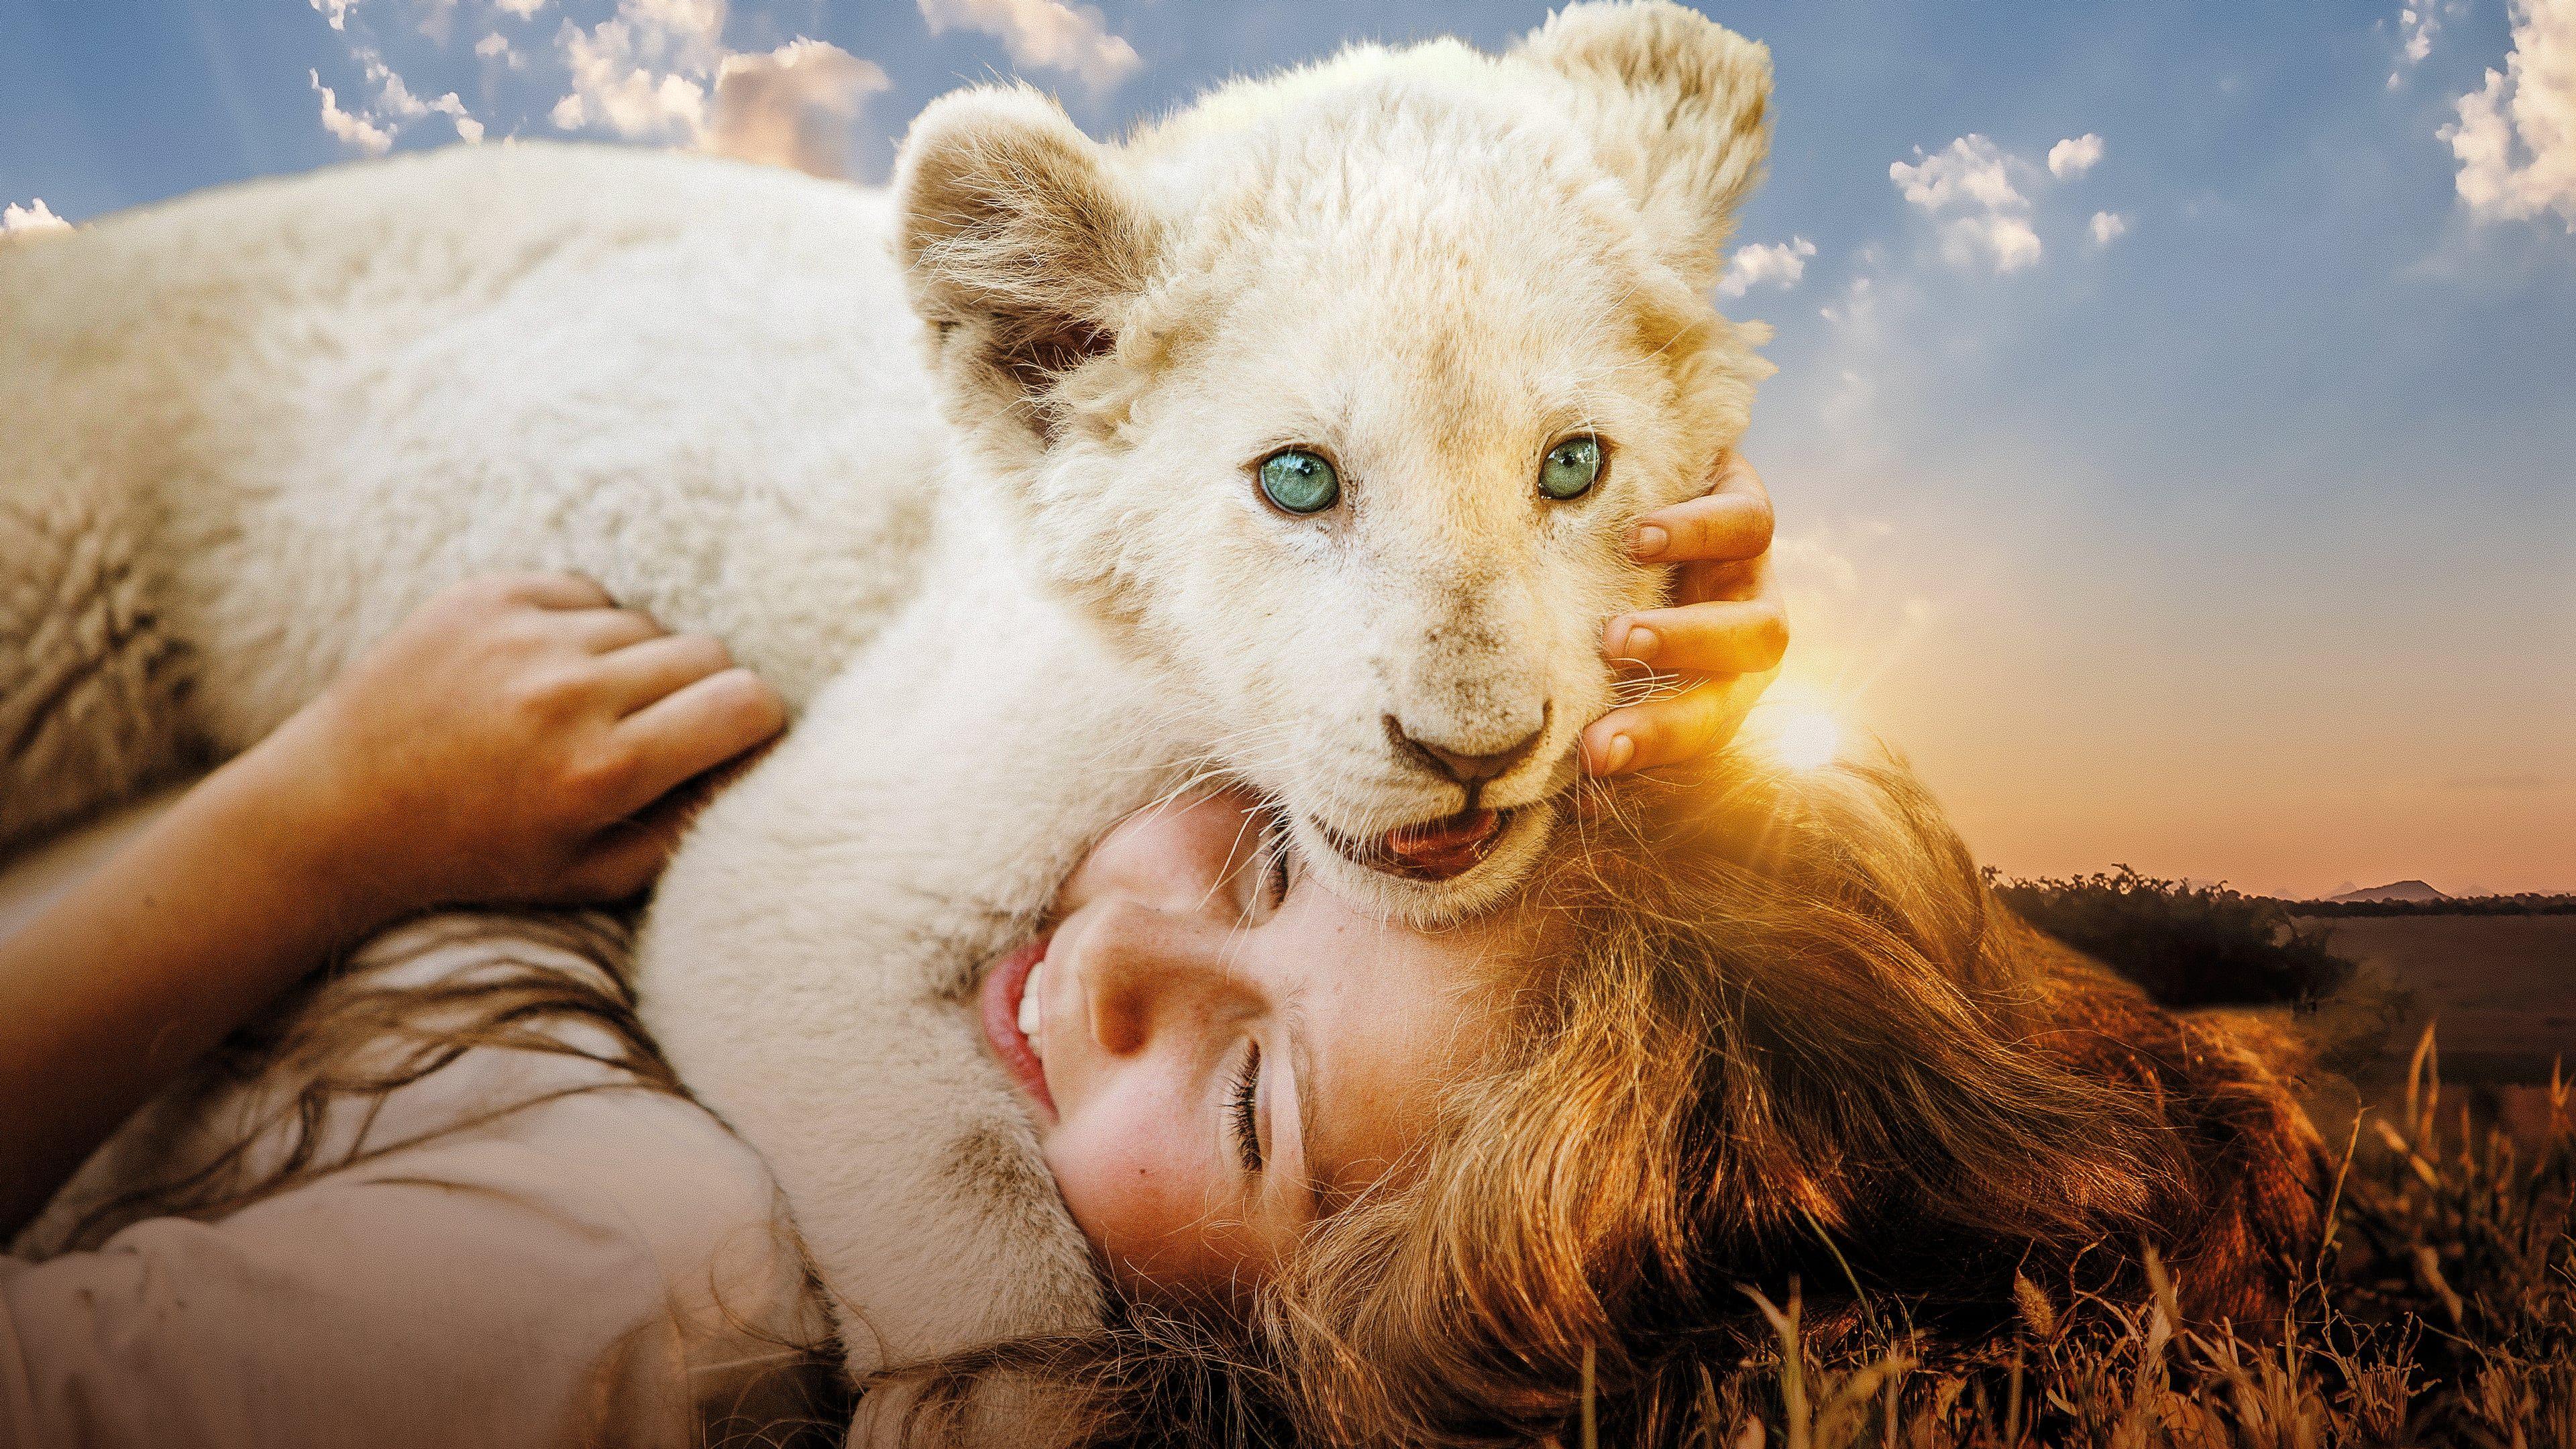 Kijken Mia Et Le Lion Blanc Films Gratis Met Ondertiteling Film Spanyol